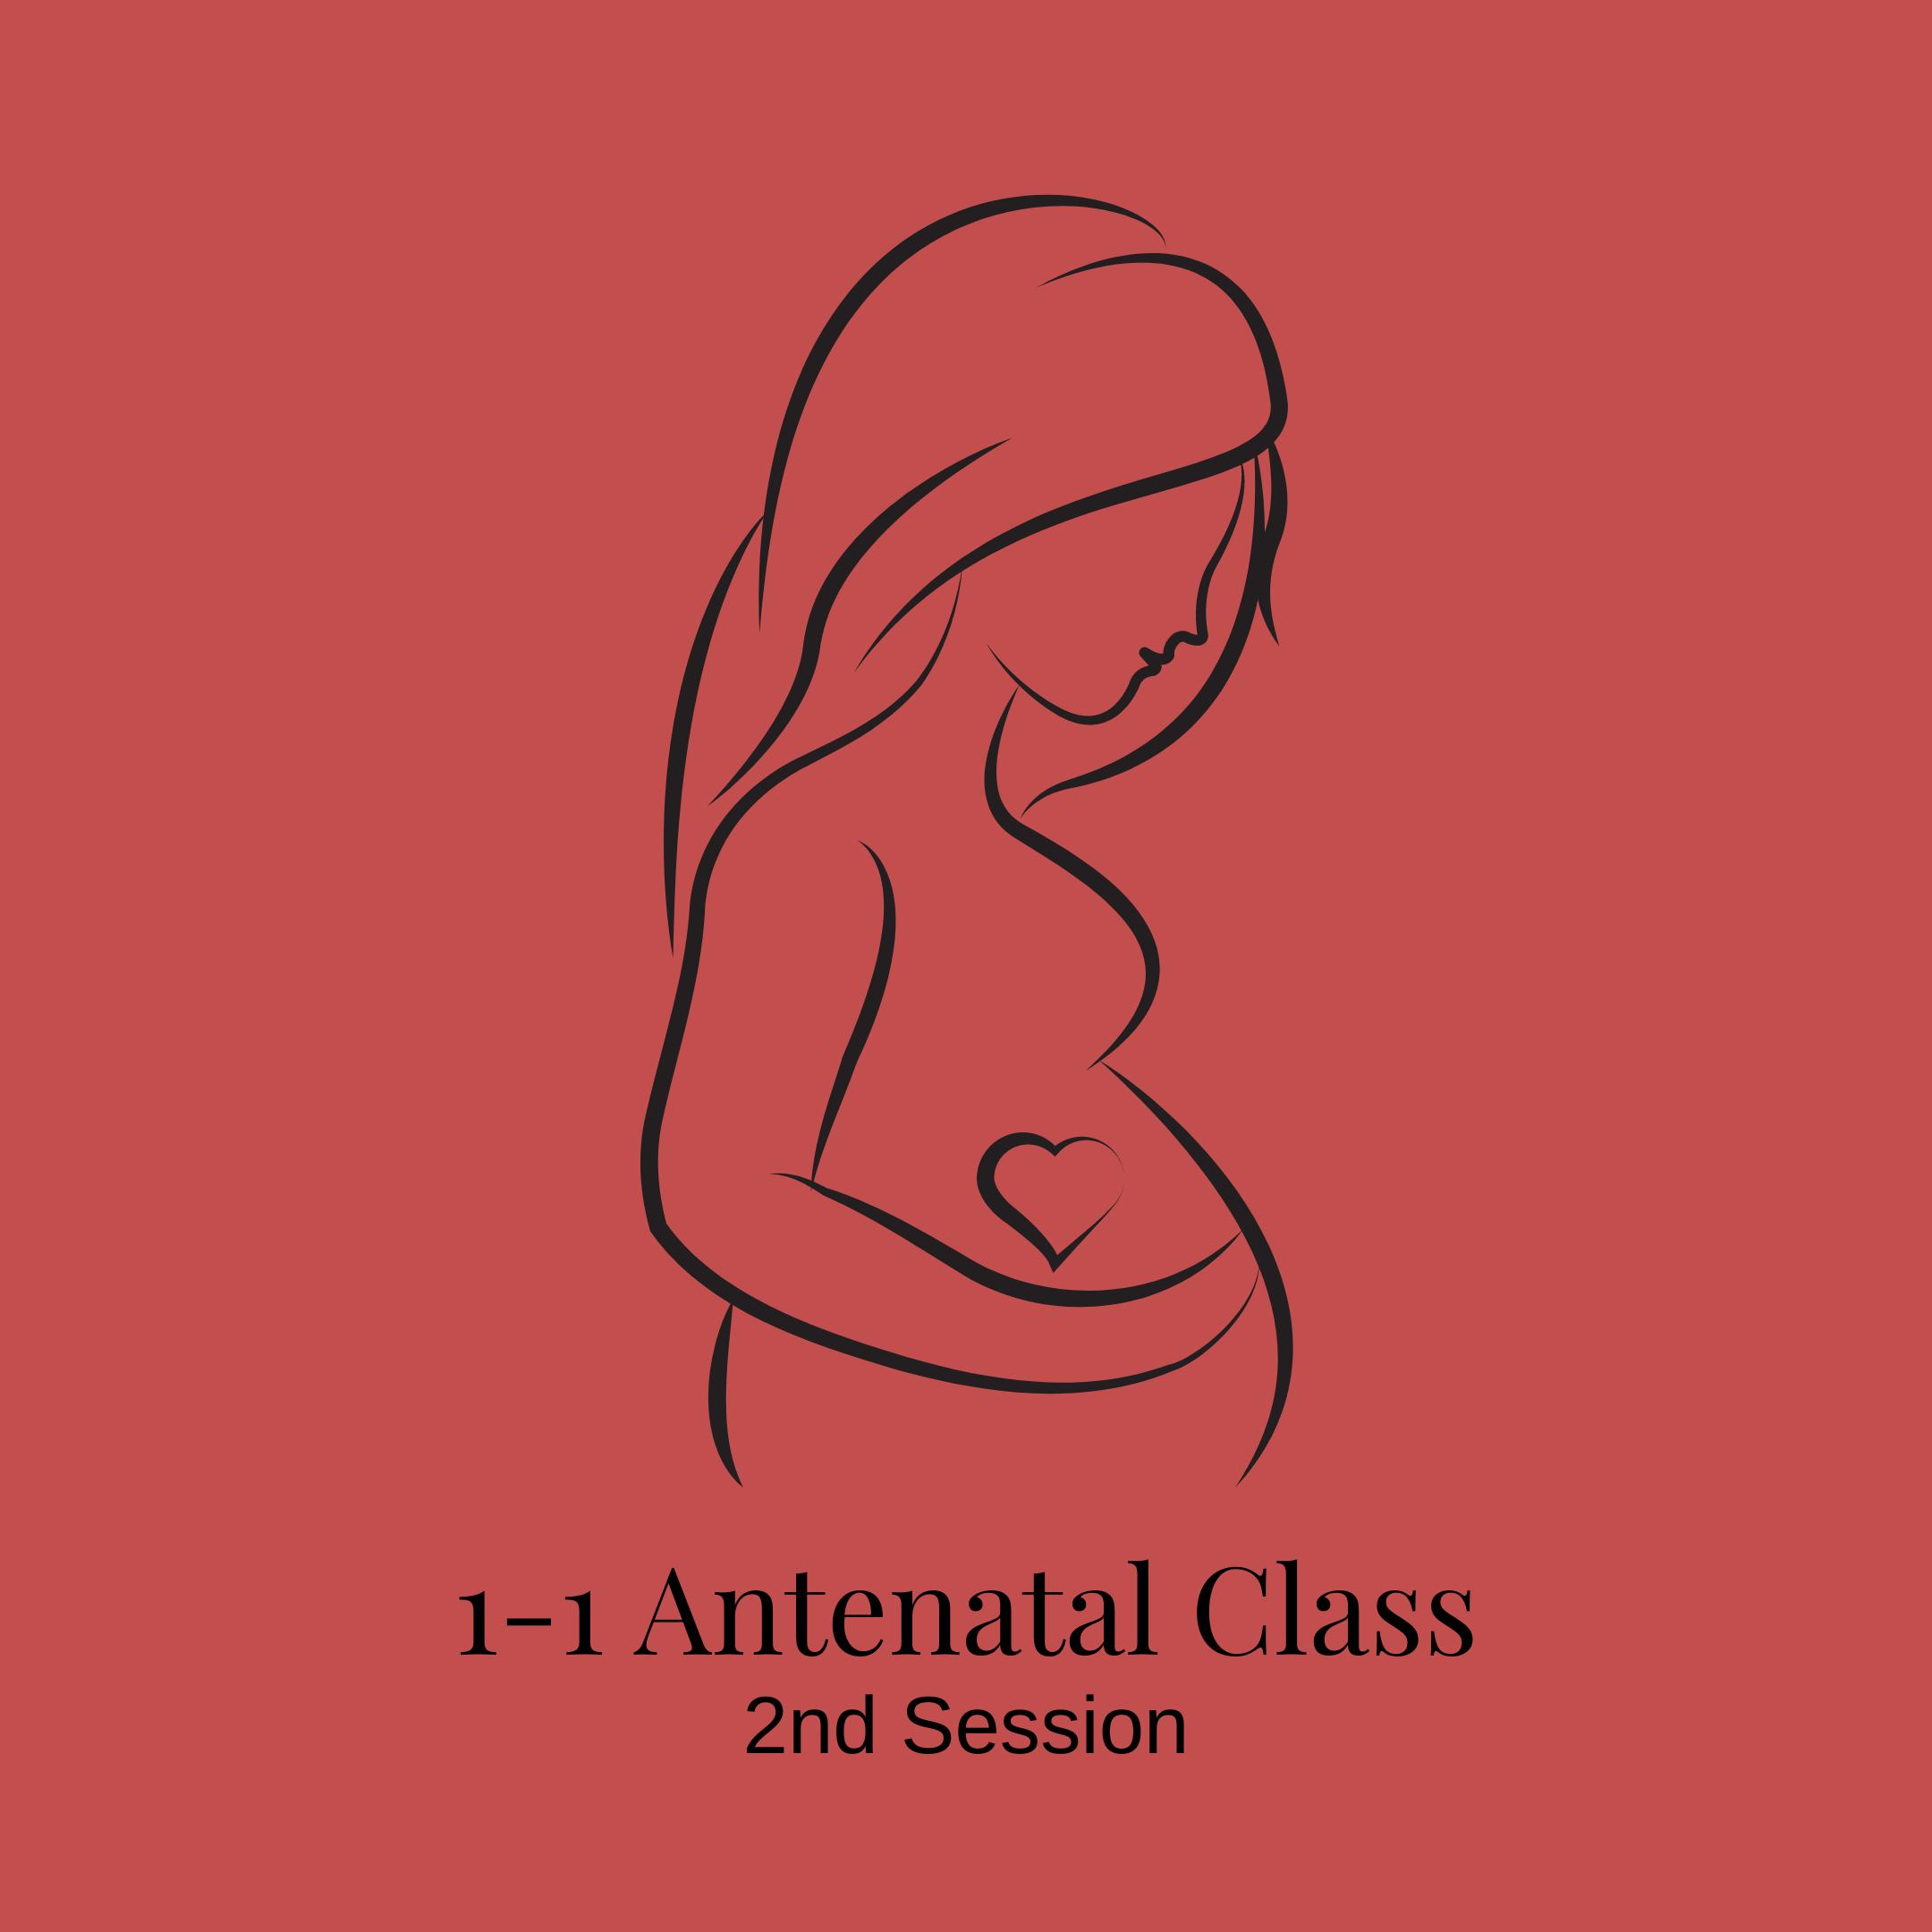 1-1 Antenatal Class: 2nd Session